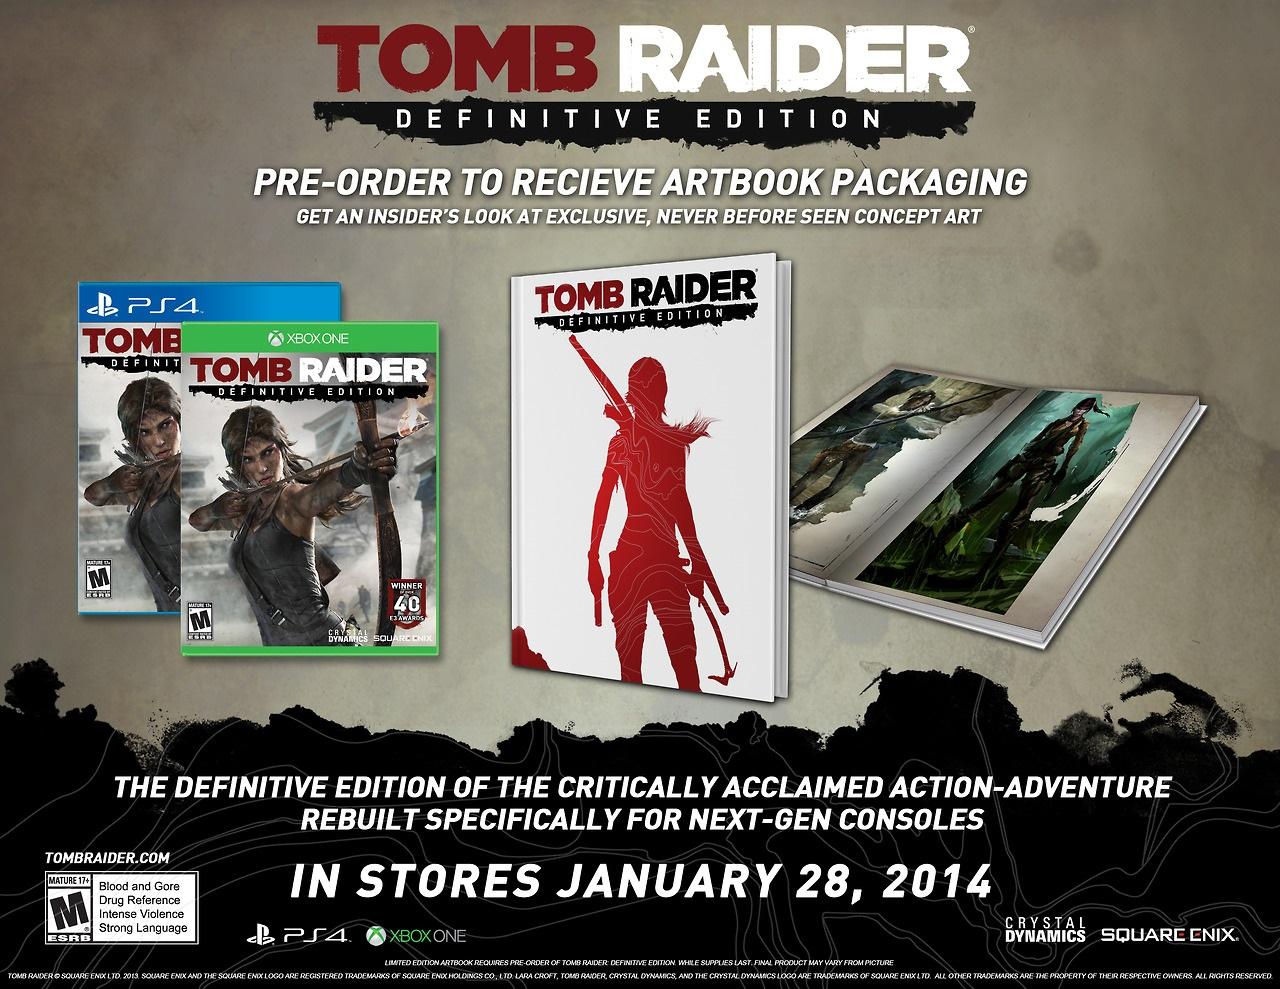 tomb raider definitive edition pre-order bonus